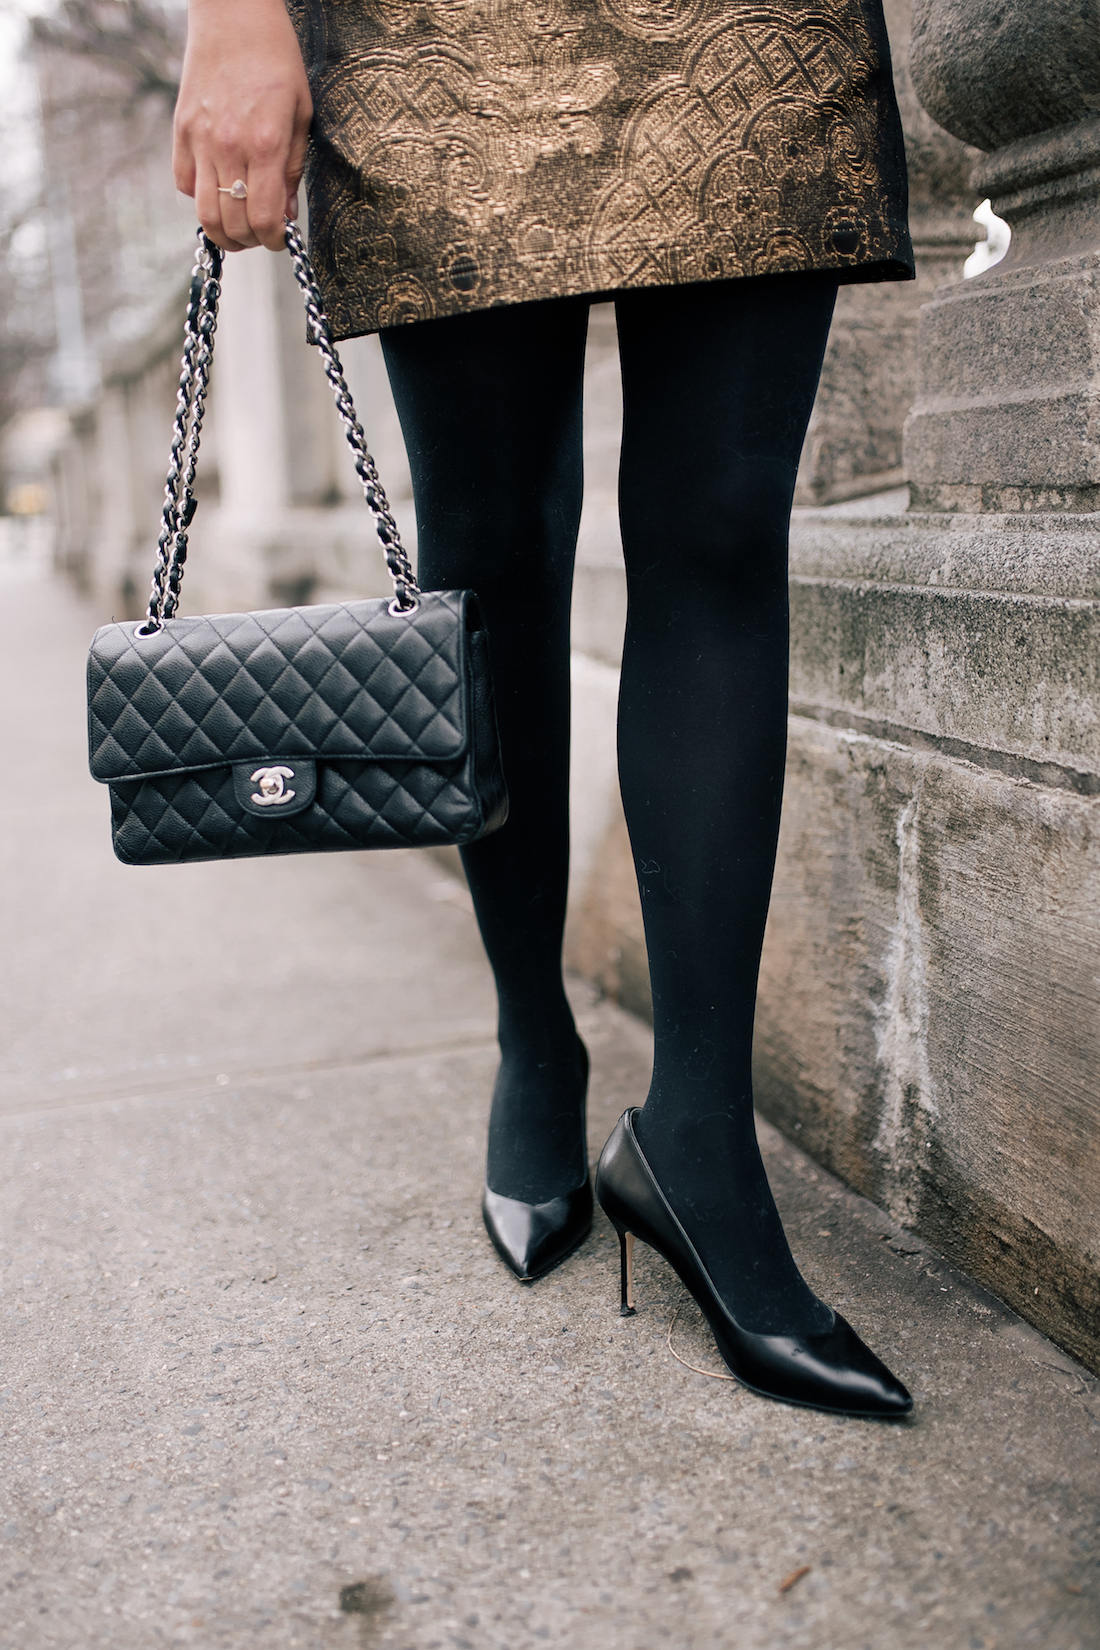 Chanel Bag and Black Pumps